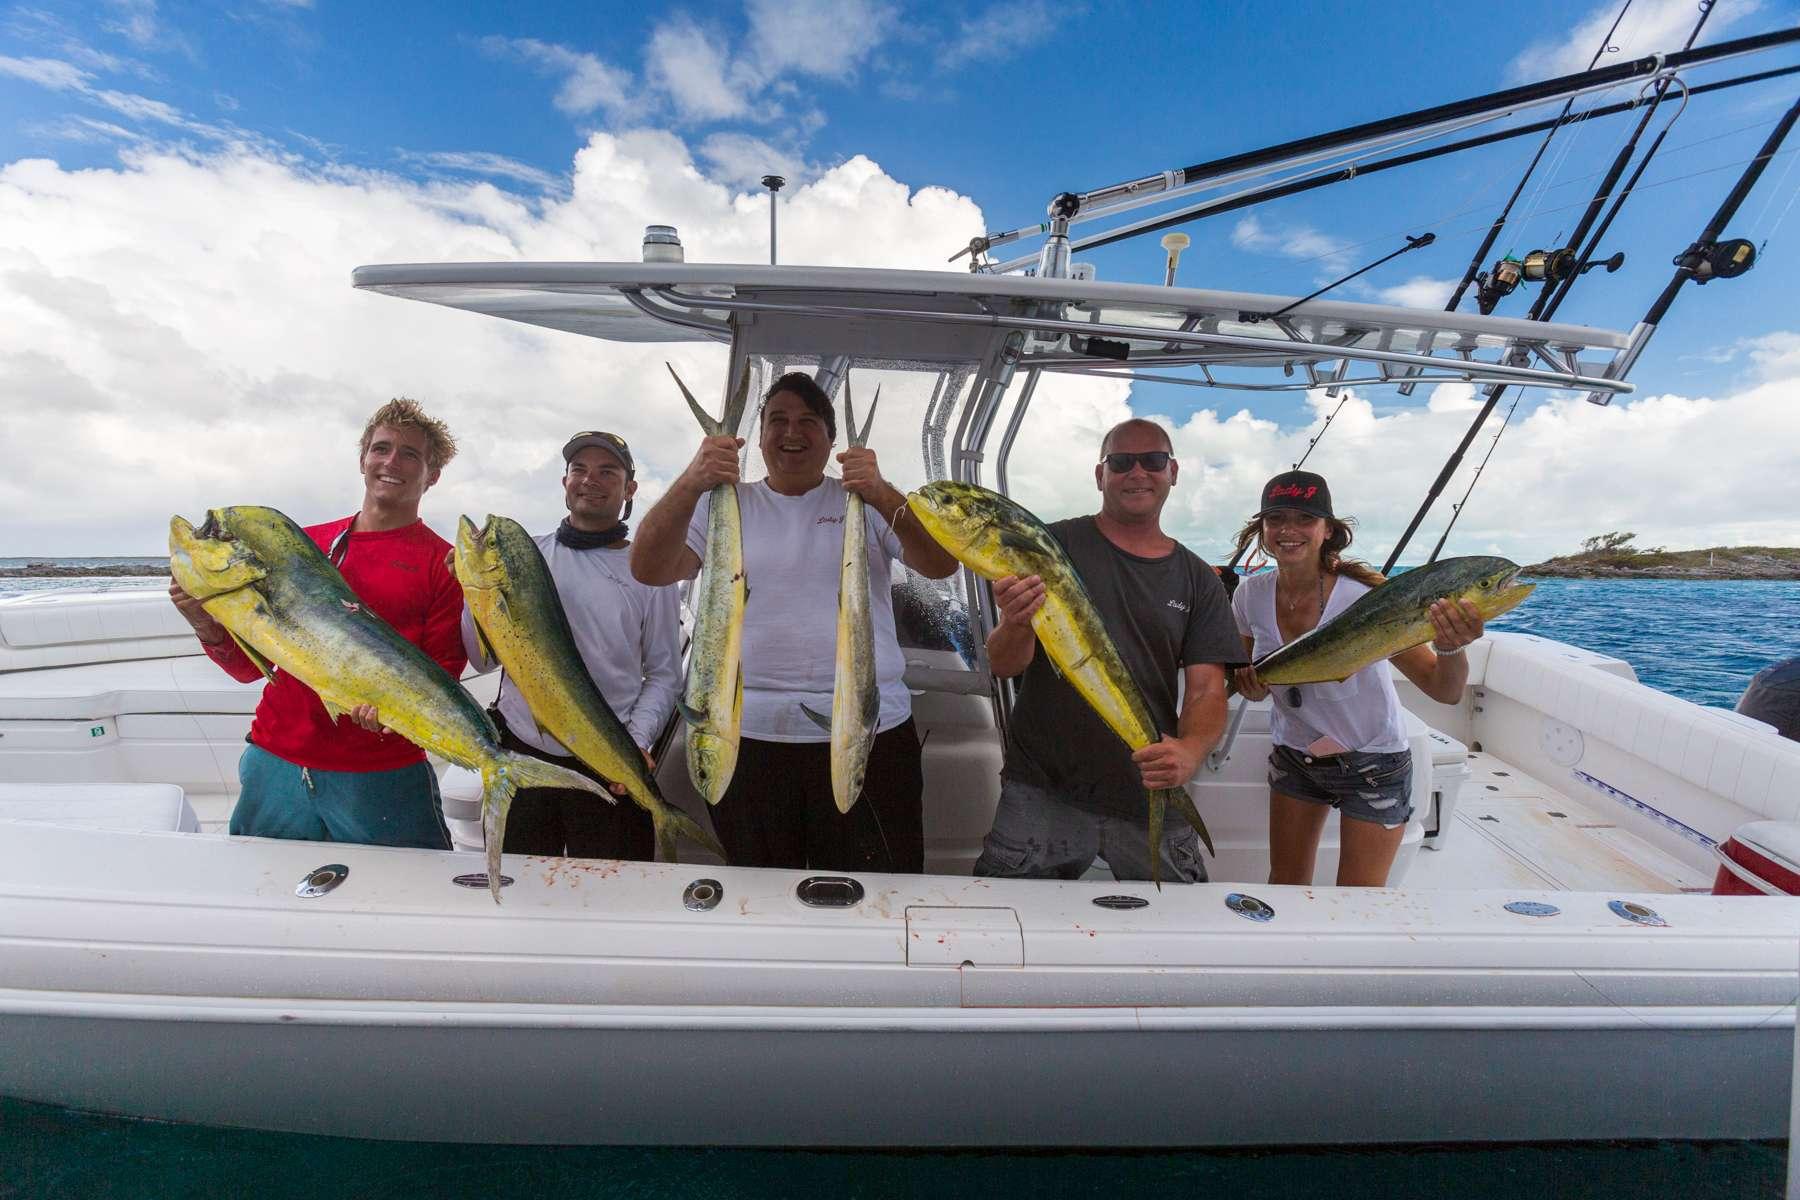 Motor Yacht 'LADY J' Fishing, 12 PAX, 9 Crew, 142.00 Ft, 43.00 Meters, Built 1997, Palmer Johnson, Refit Year 2017